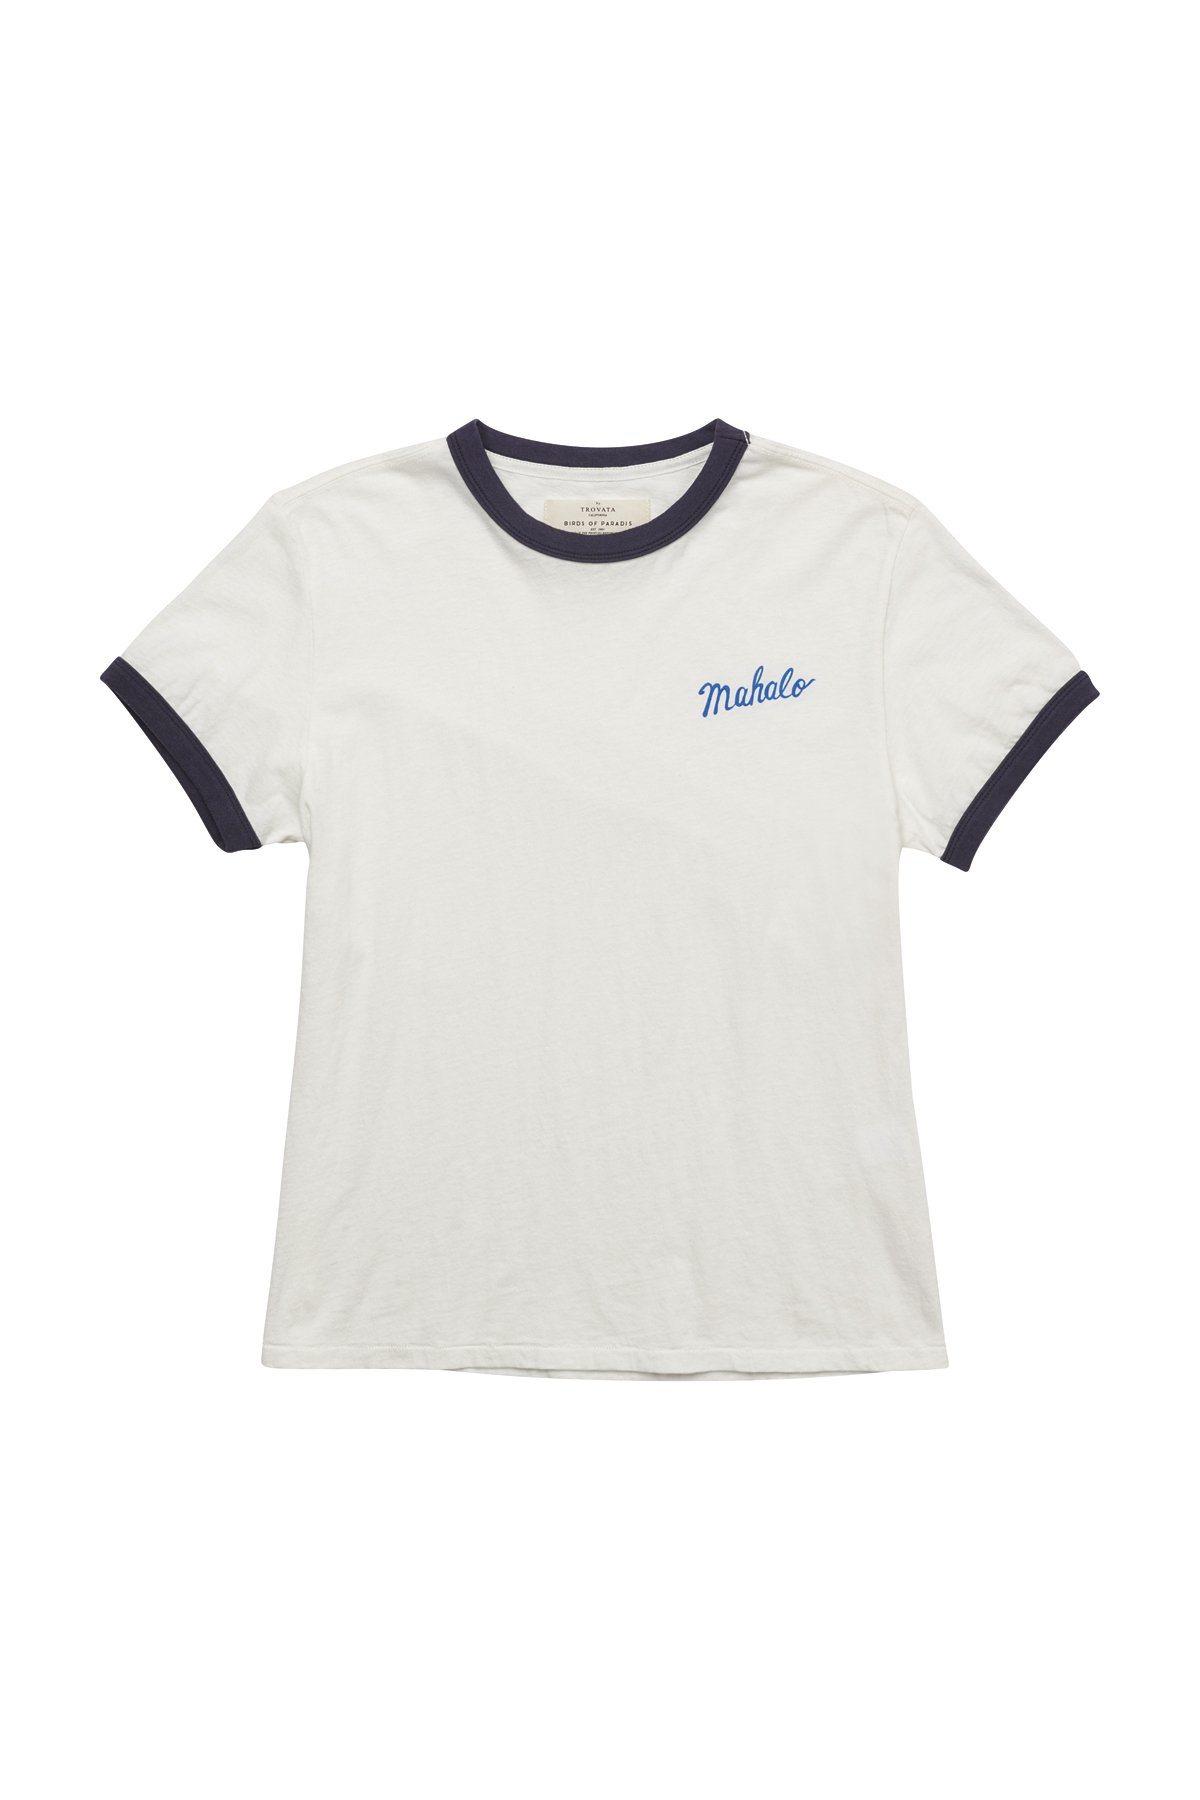 Lennox ringer T-shirt ANT WHITE MAHALO by Trovata - 1